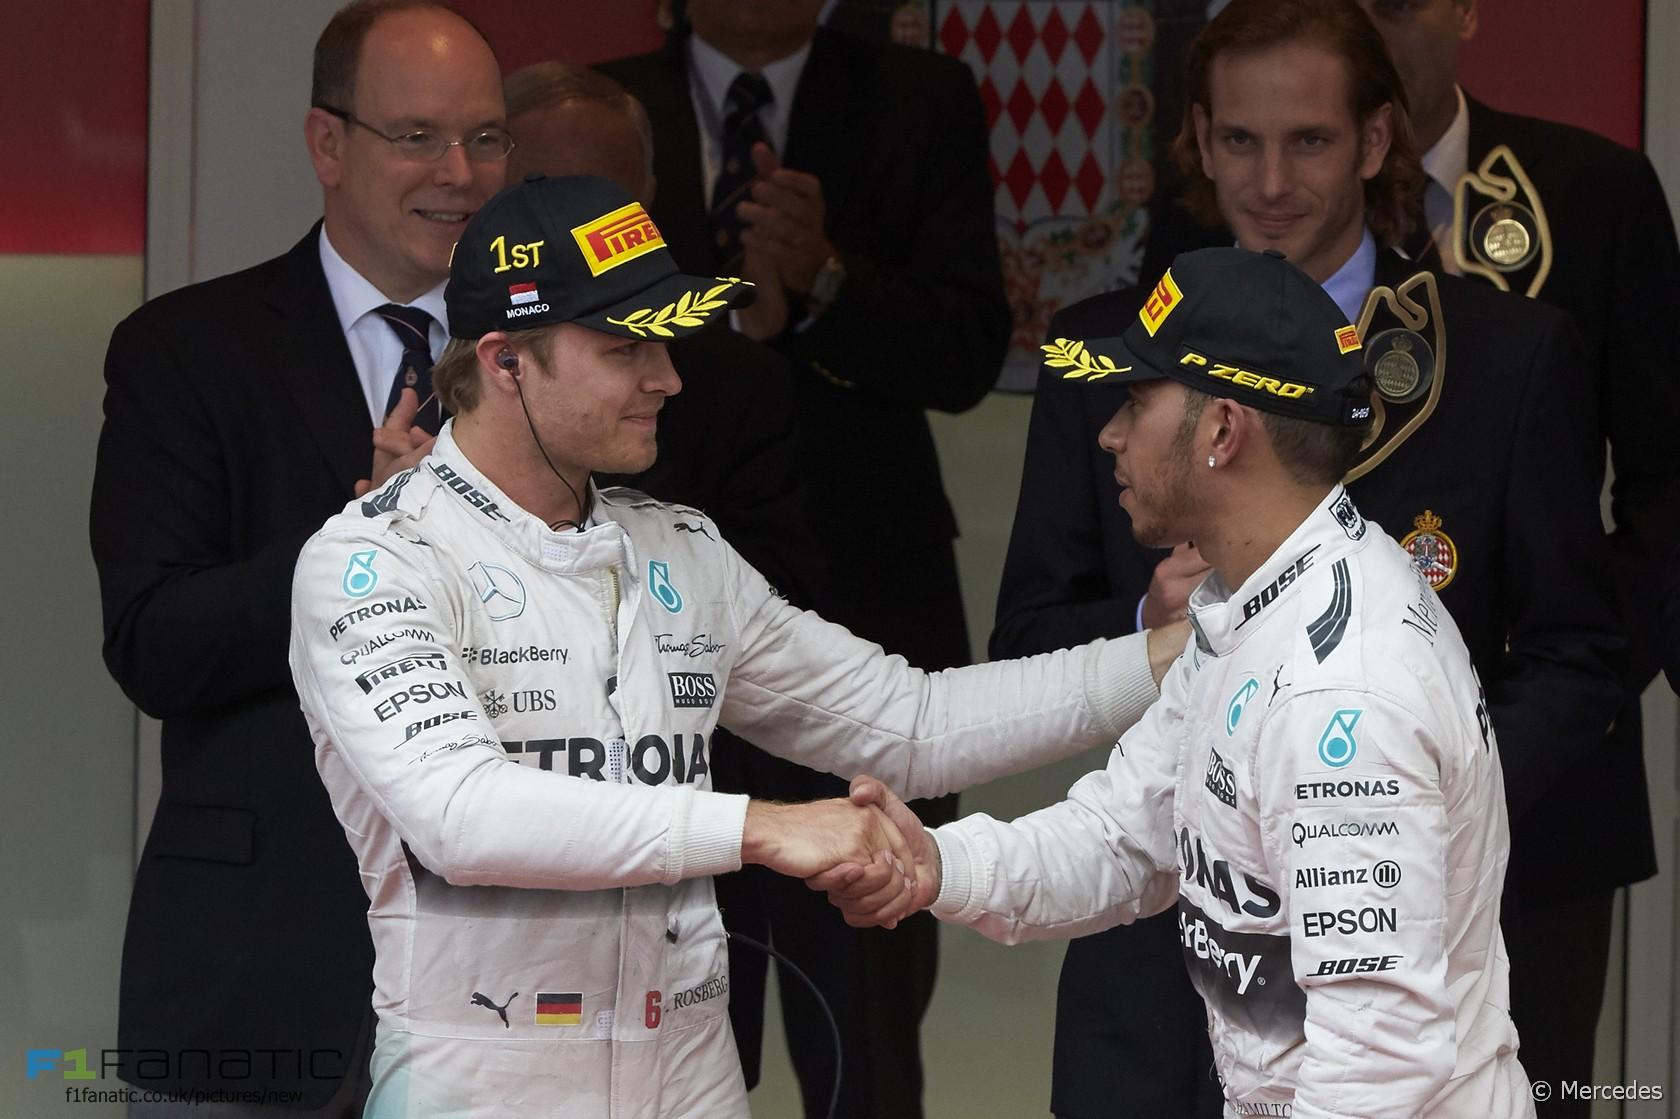 Nico Rosberg, Lewis Hamilton, Mercedes, Monte-Carlo, Monaco, 2015